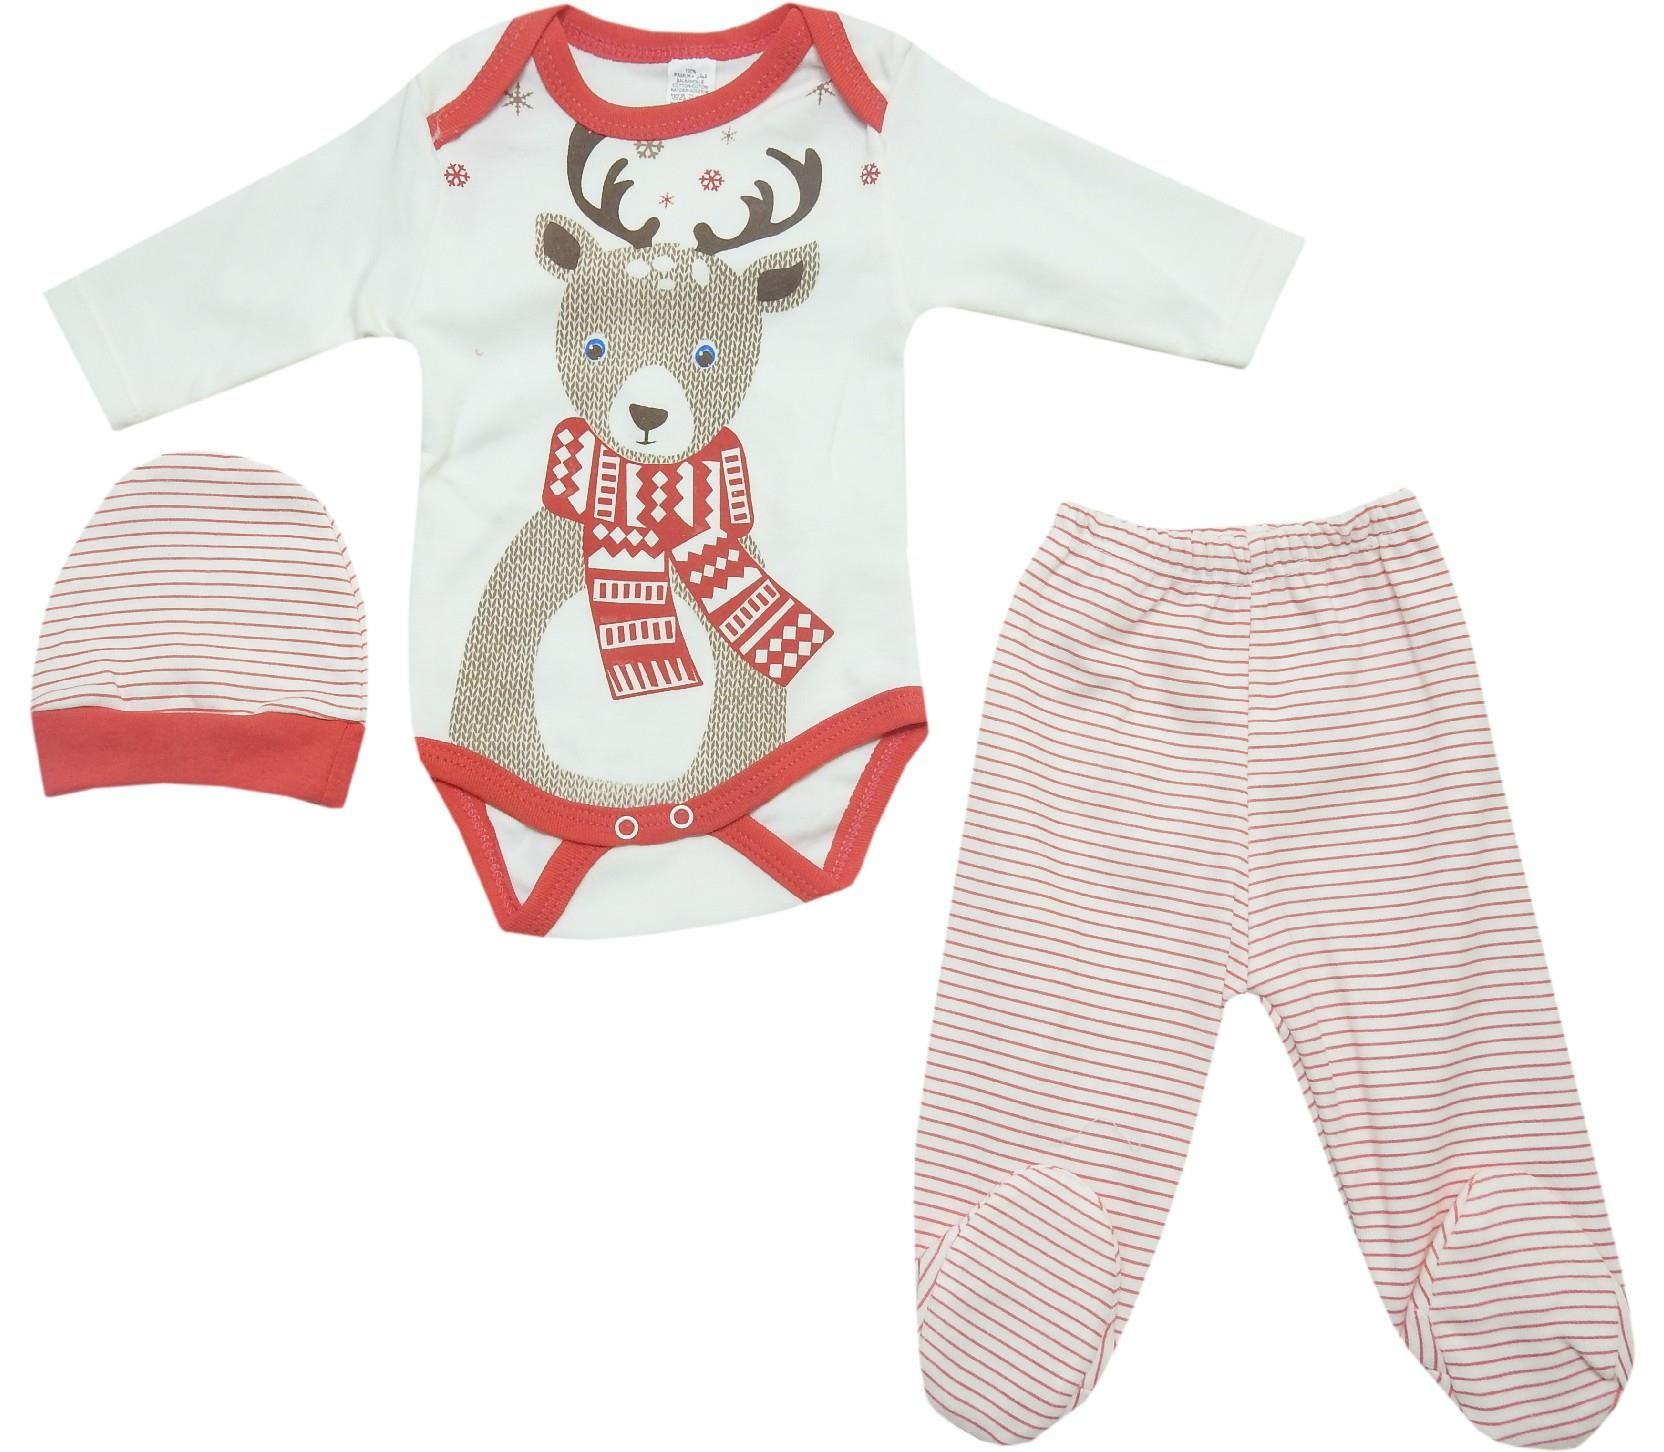 537 wholesale deer printed newborn set for baby 6 9 12 month